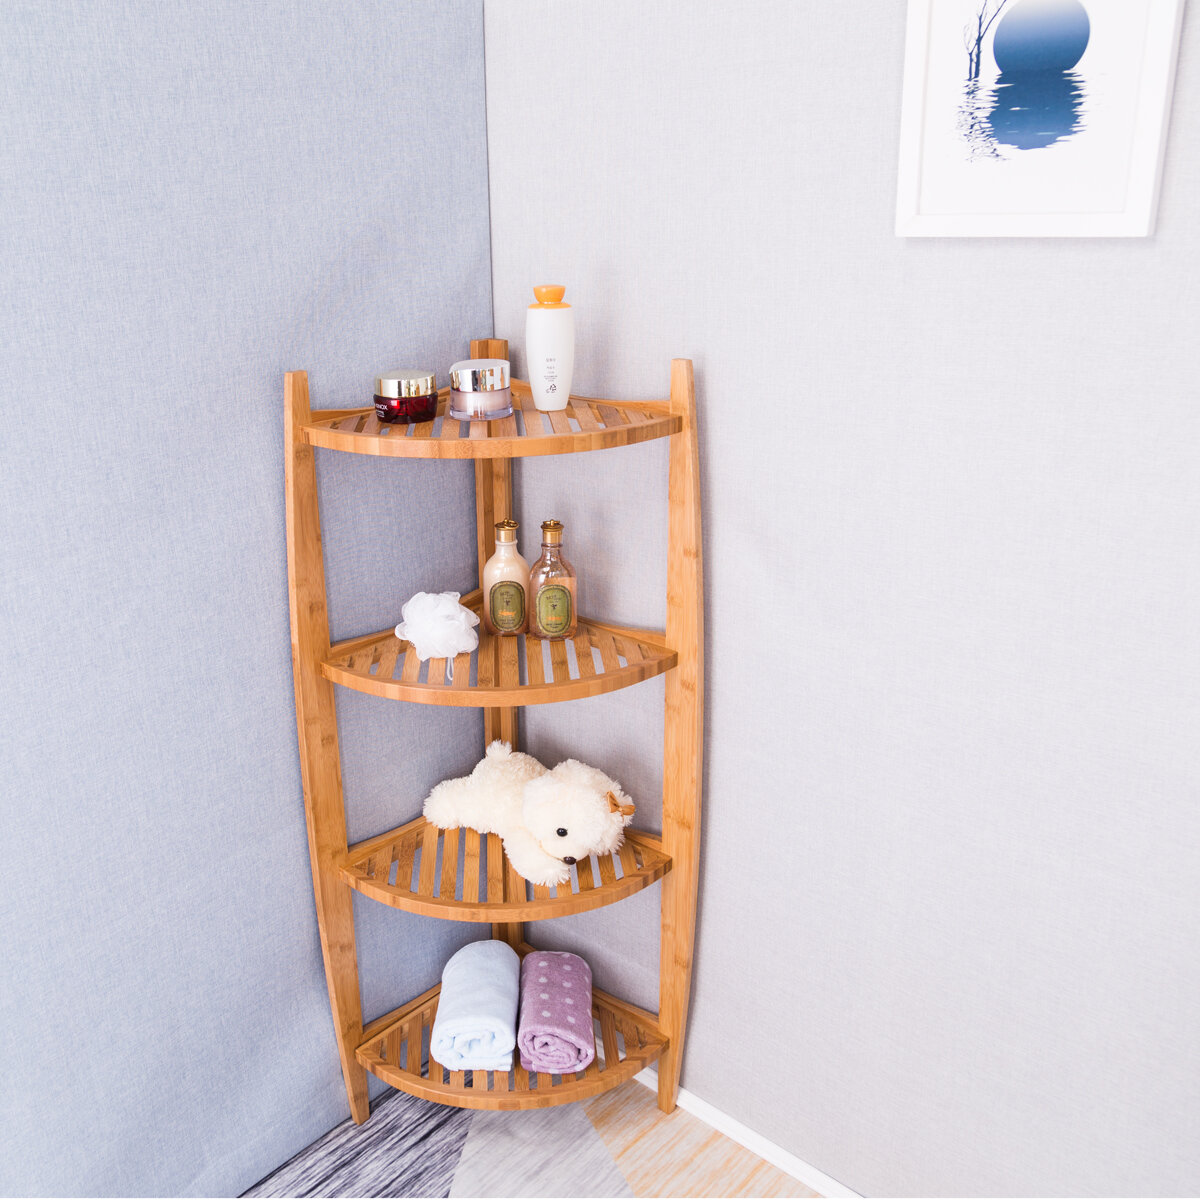 Highland Dunes Stonington Natural Bamboo Corner 43 2 W X 20 H Bathroom Shelf Wayfair